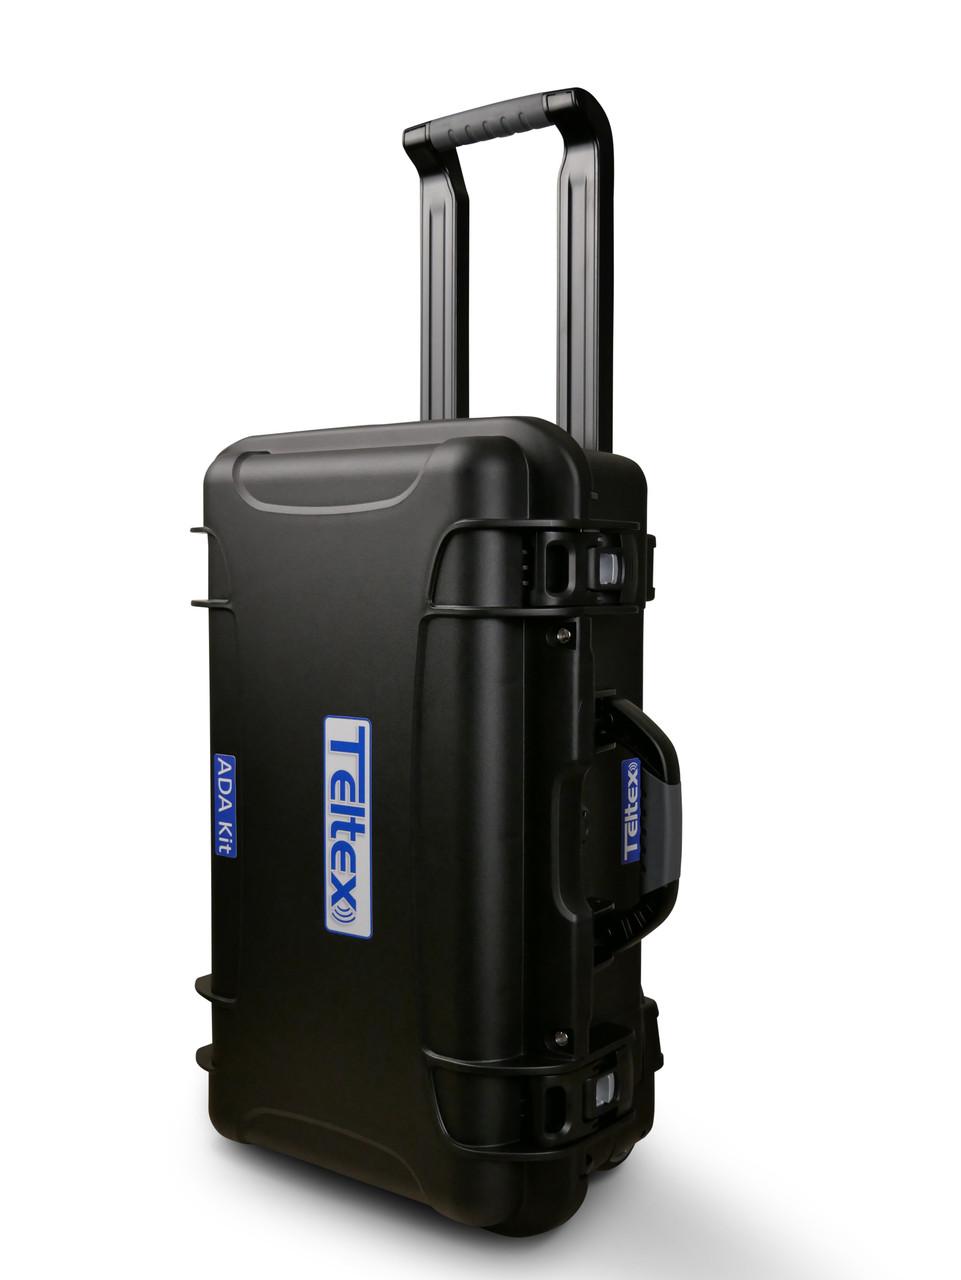 Emergency Communications Kit - Wheeled Case with Telescoping Handle